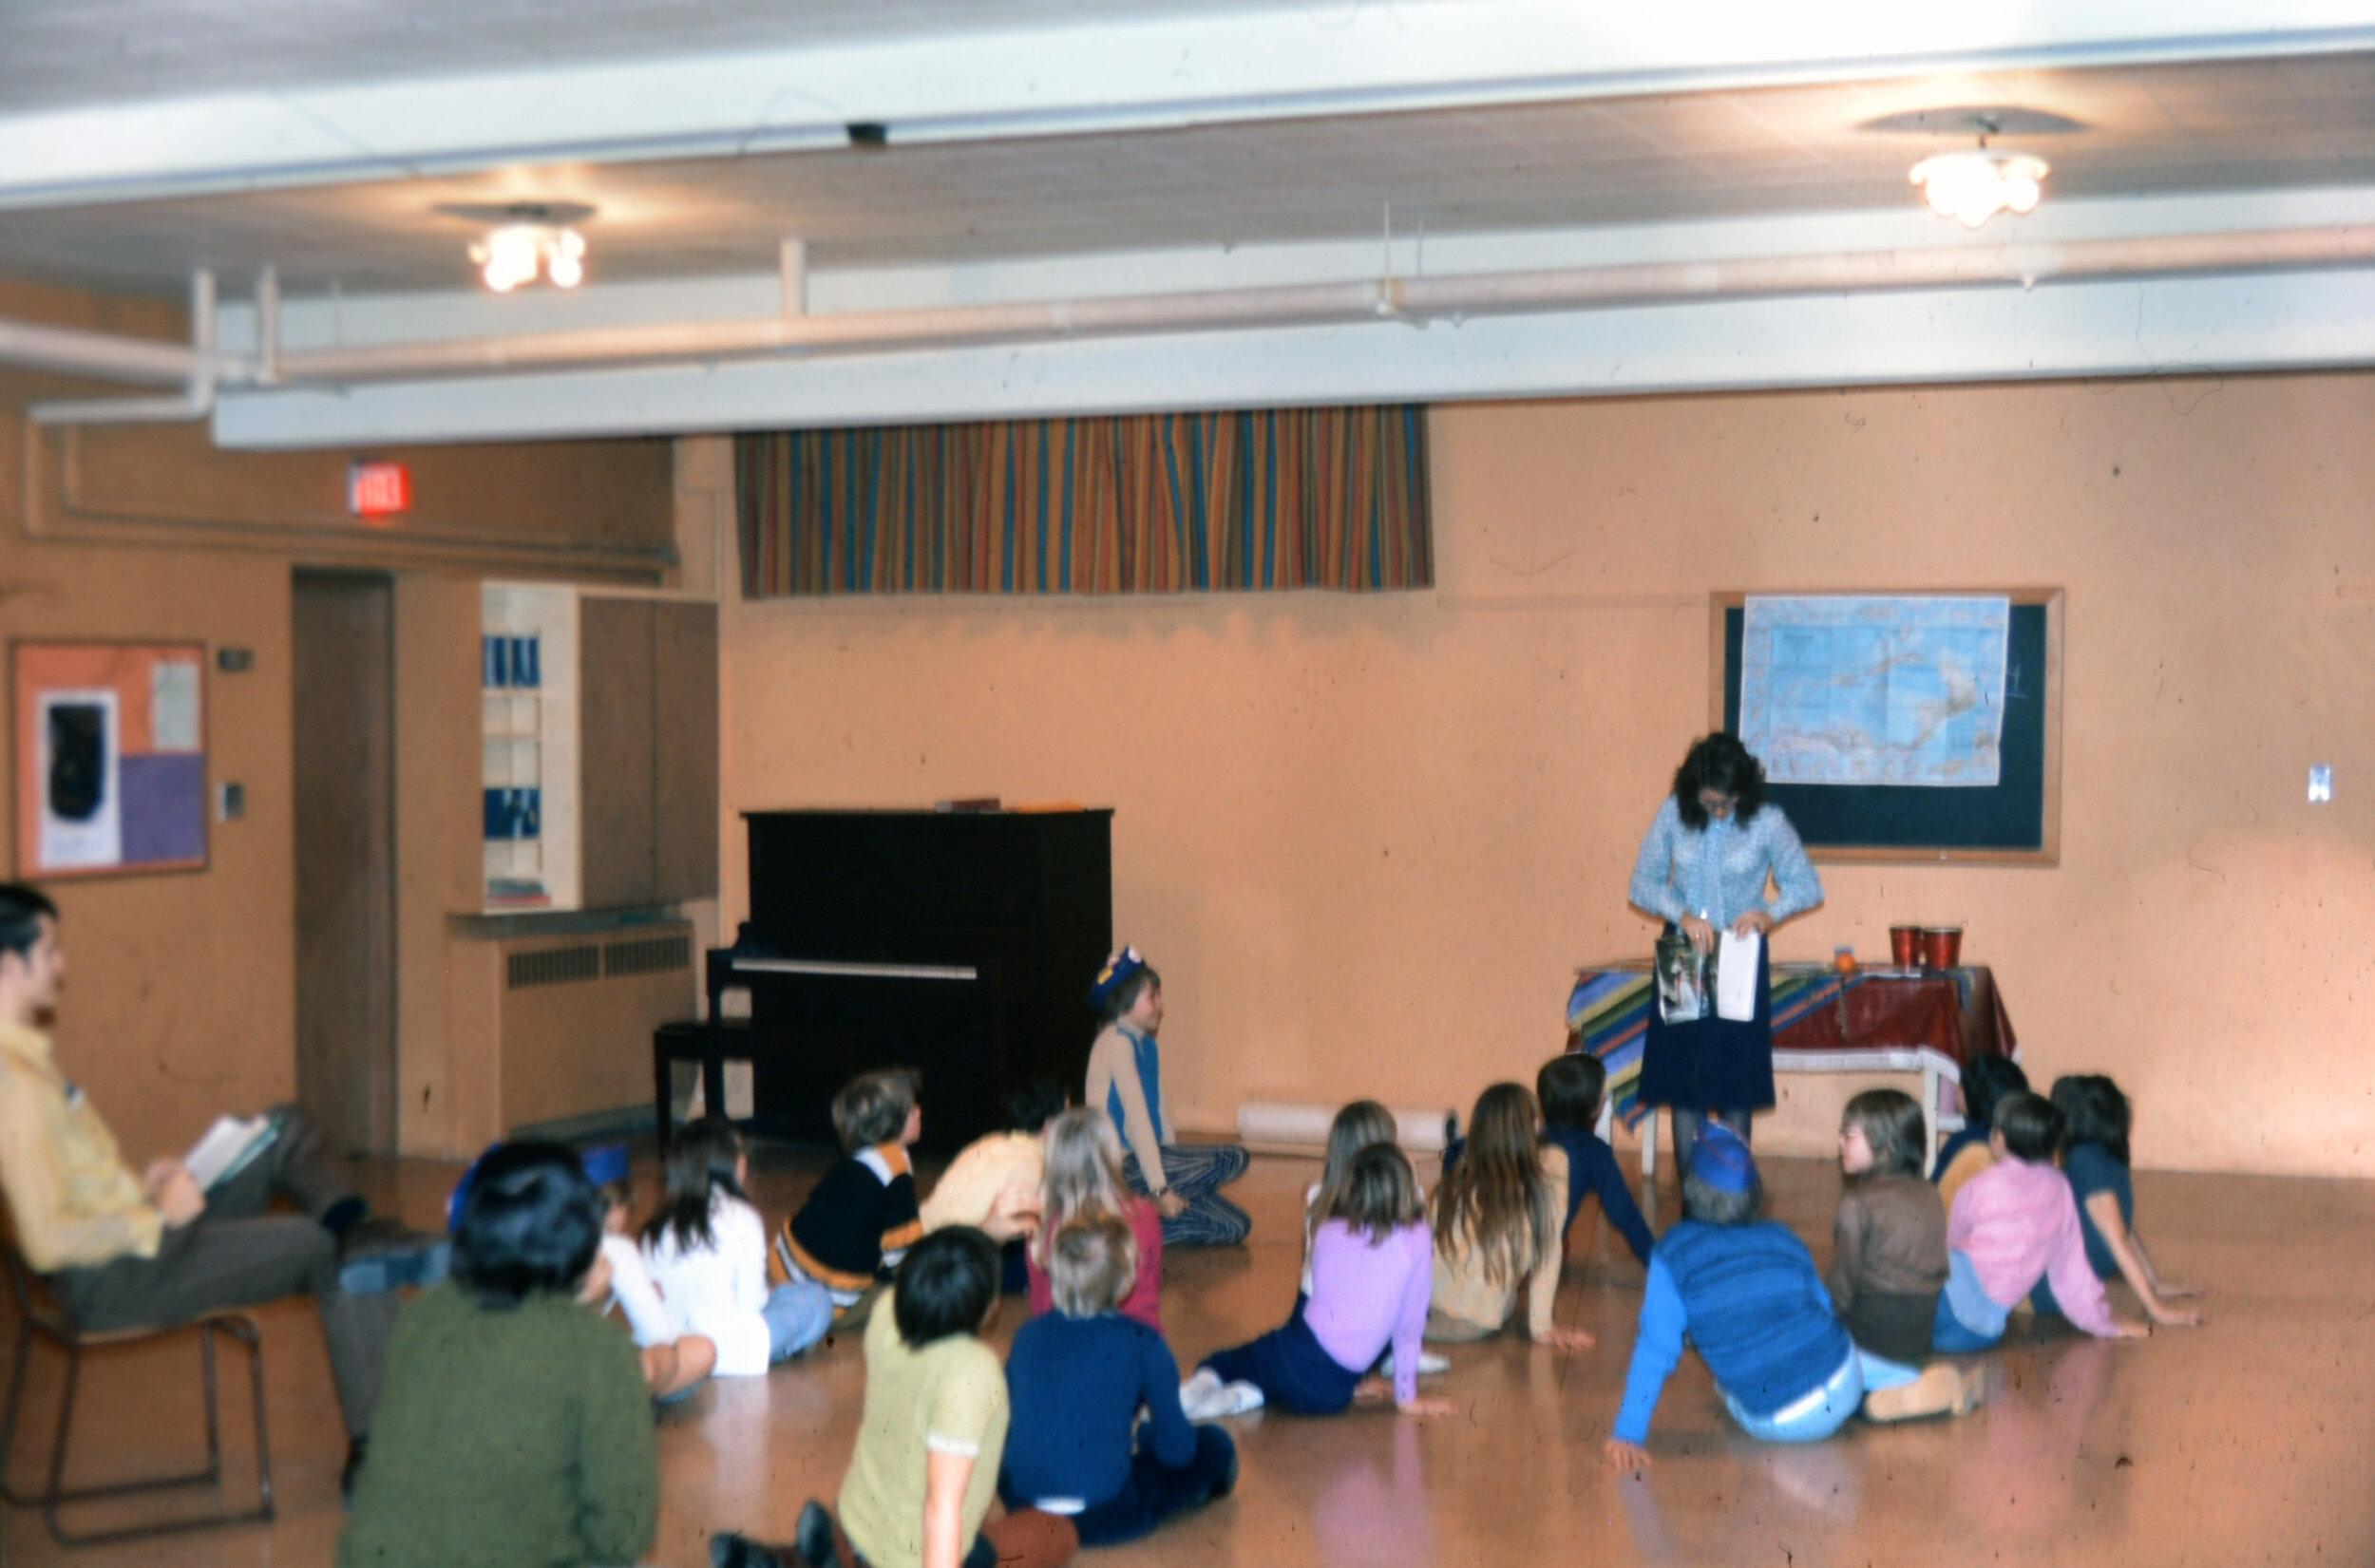 SGC 1970s - Sunday School